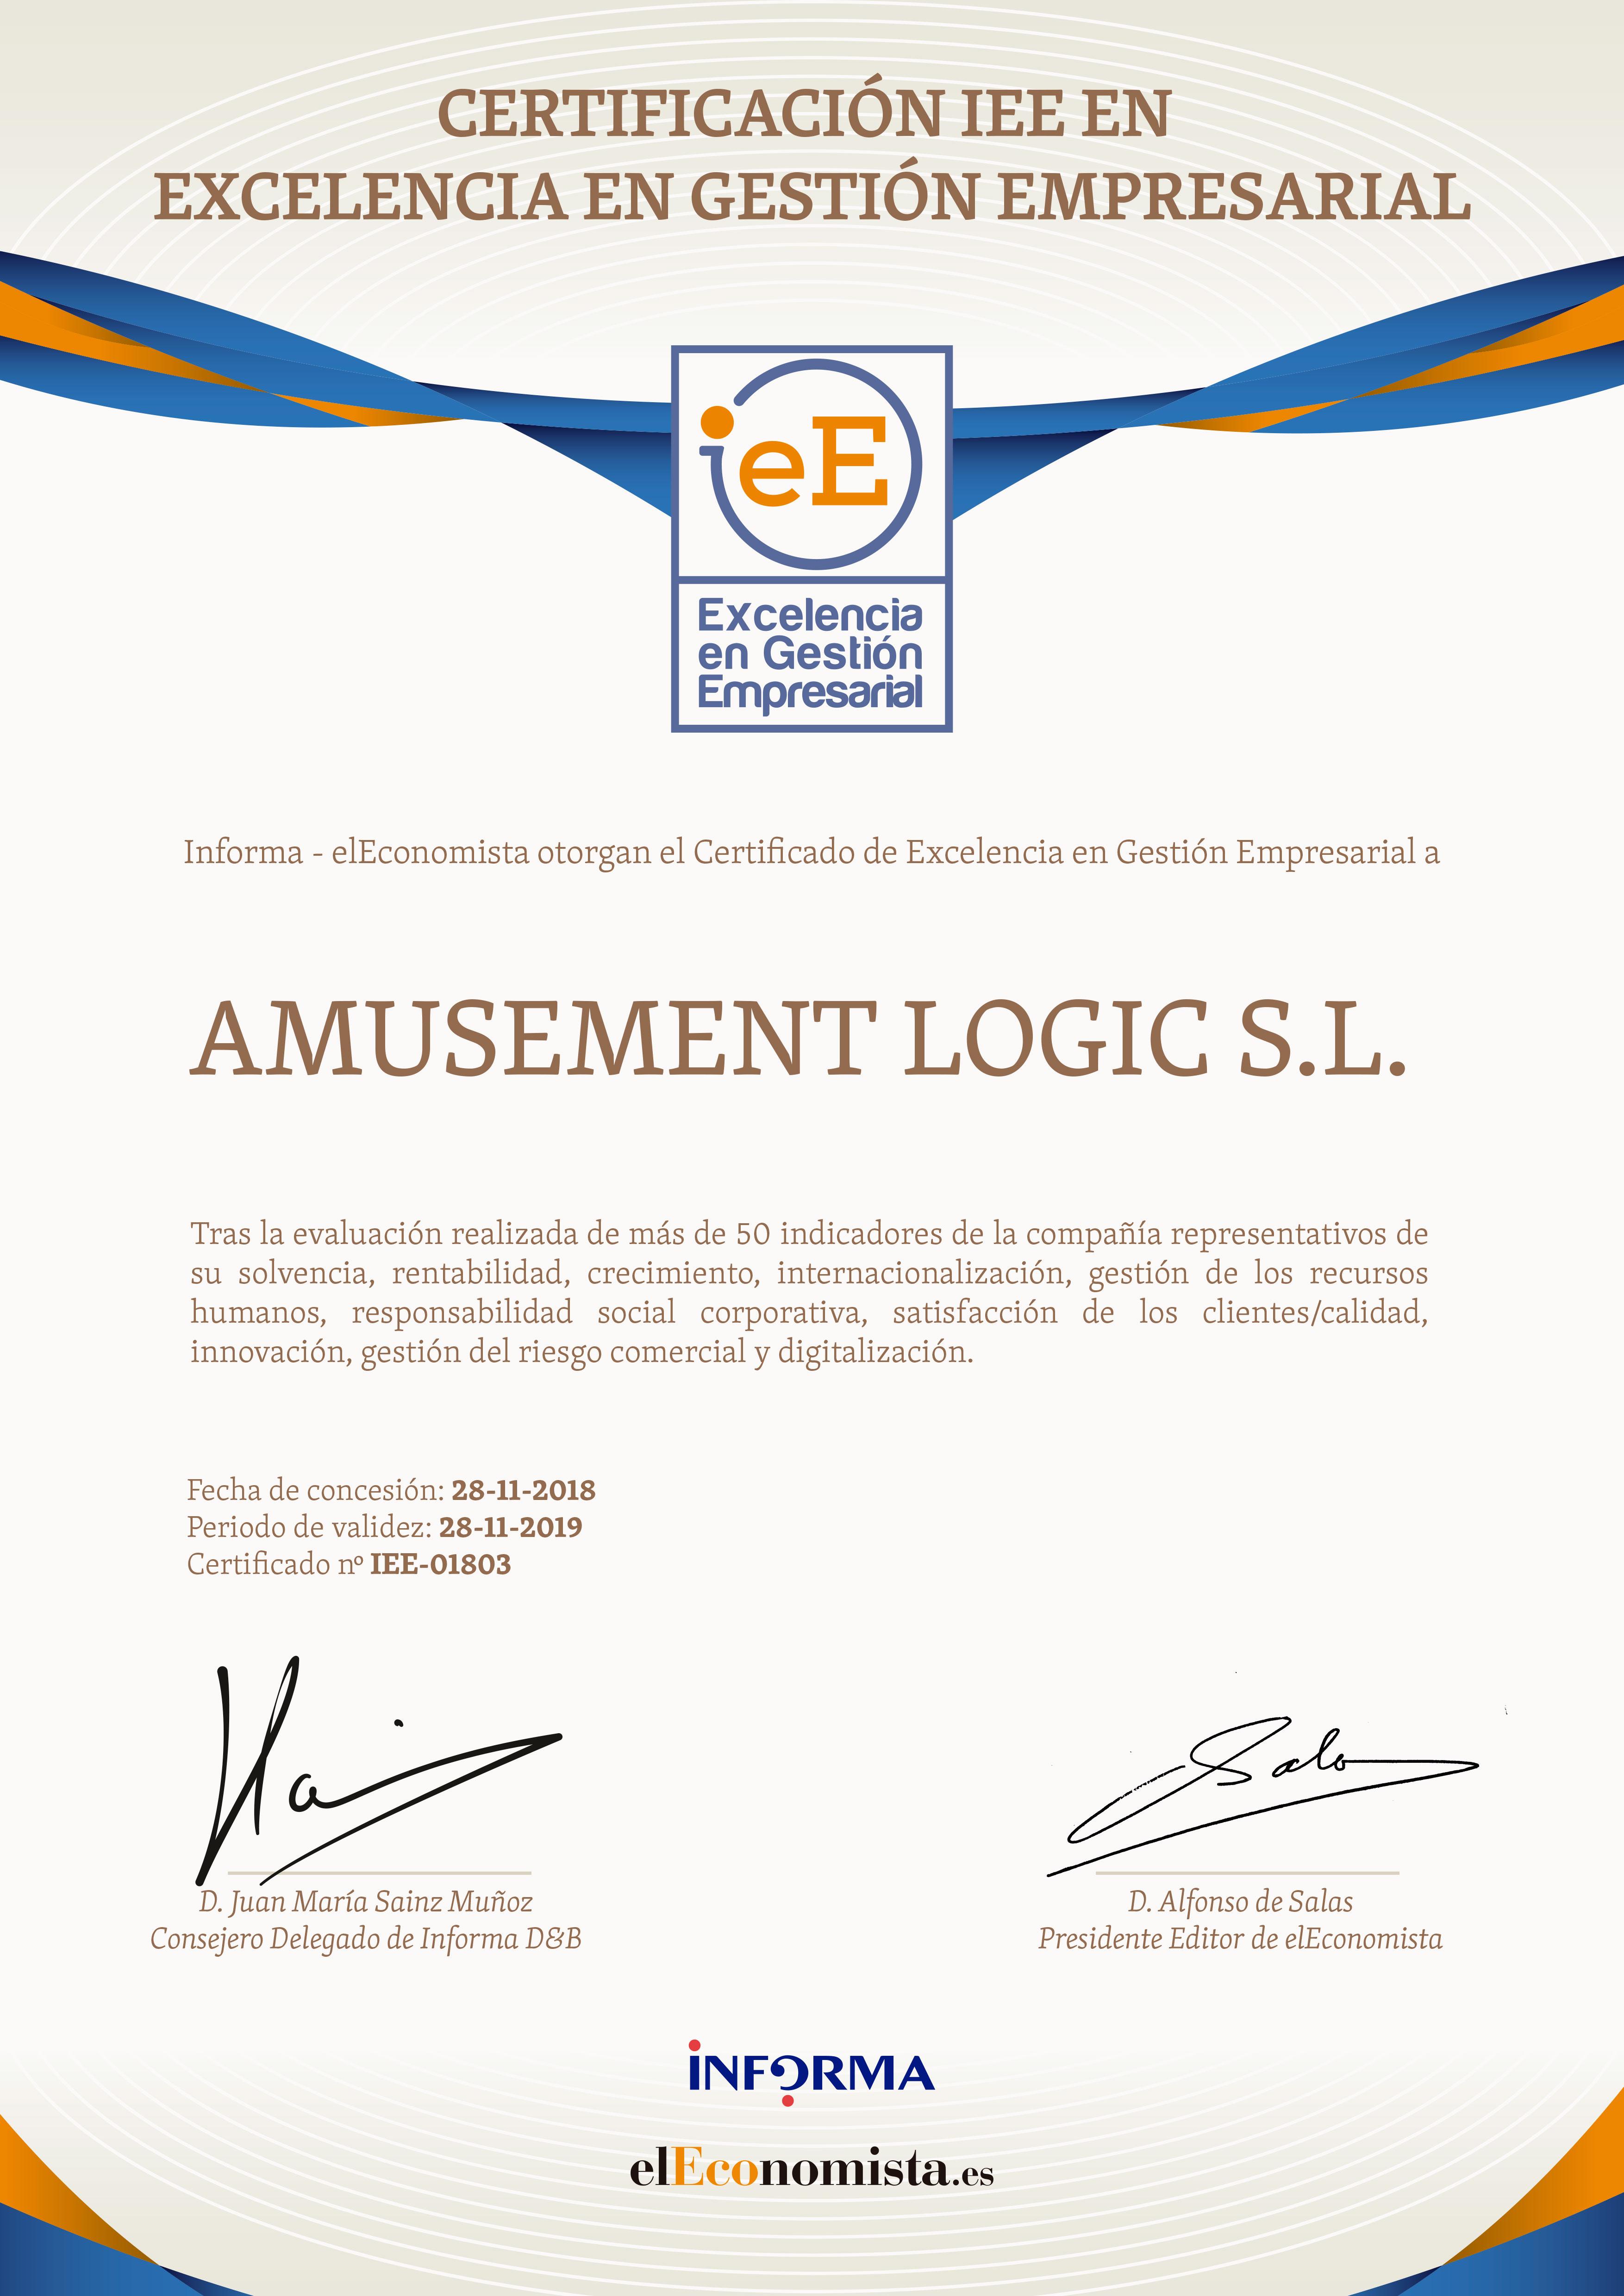 Certificado-IEE-01803_AMUSEMENT-LOGIC-SL-